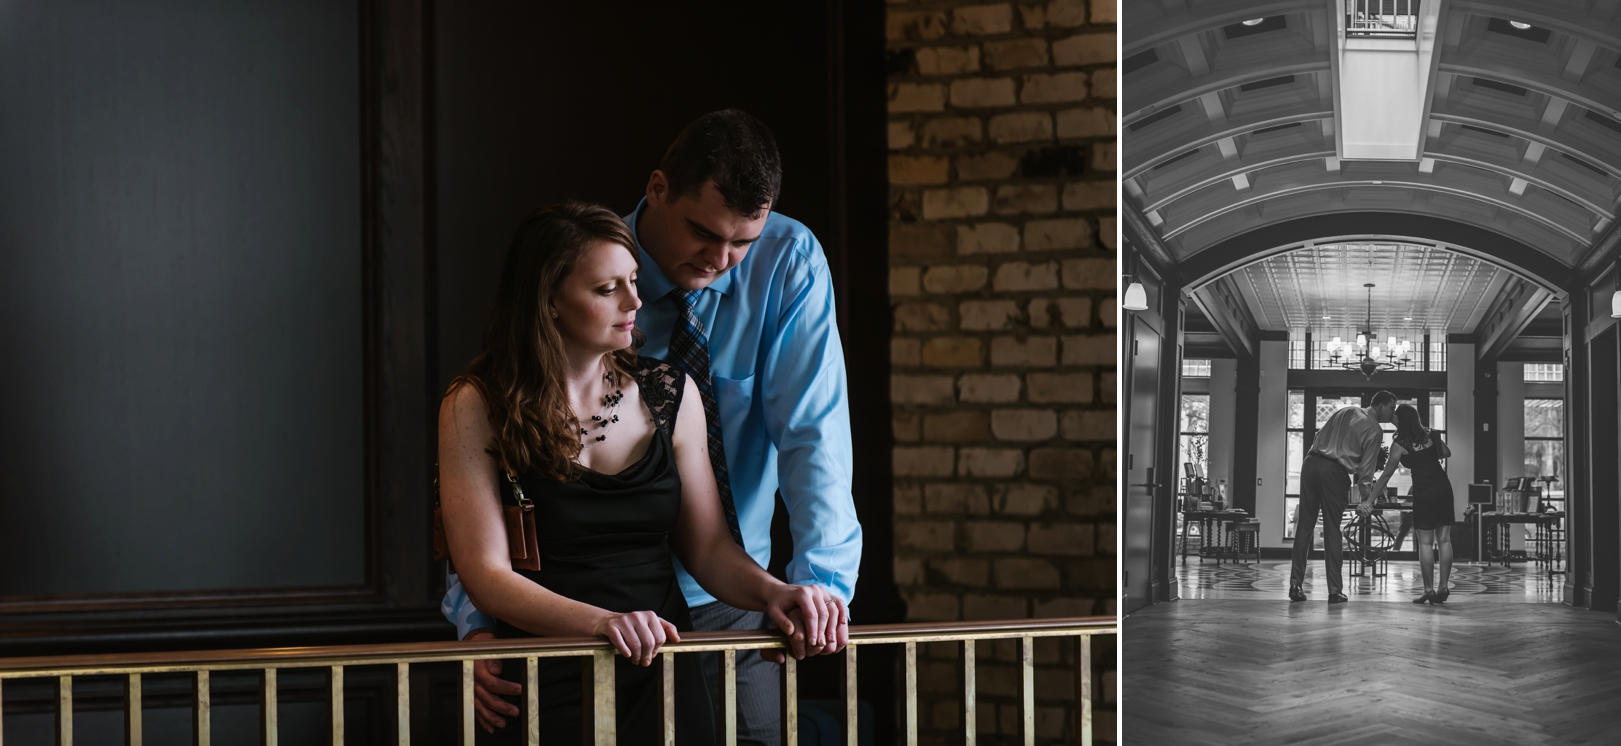 tampa-engagement-photographer-oxford-exchange_0006.jpg